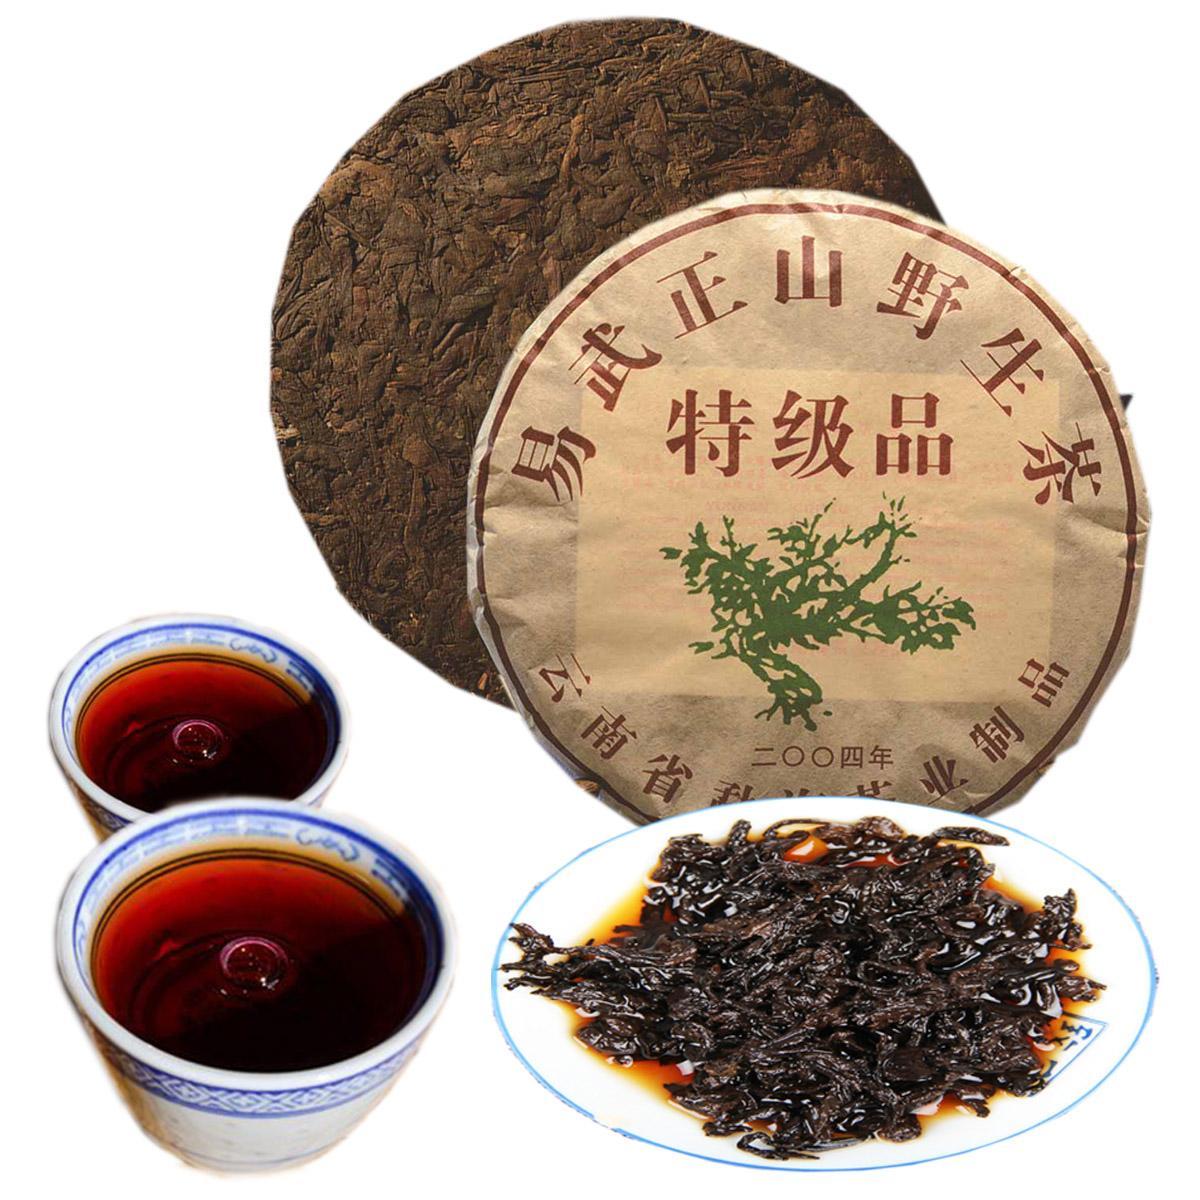 357g Maduro Pu Er chá Yunnan Menghai selvagem Pu er Tea Organic Pu'er Red Puer mais velho Árvore Natural Pu erh preto Puerh Tea bolo